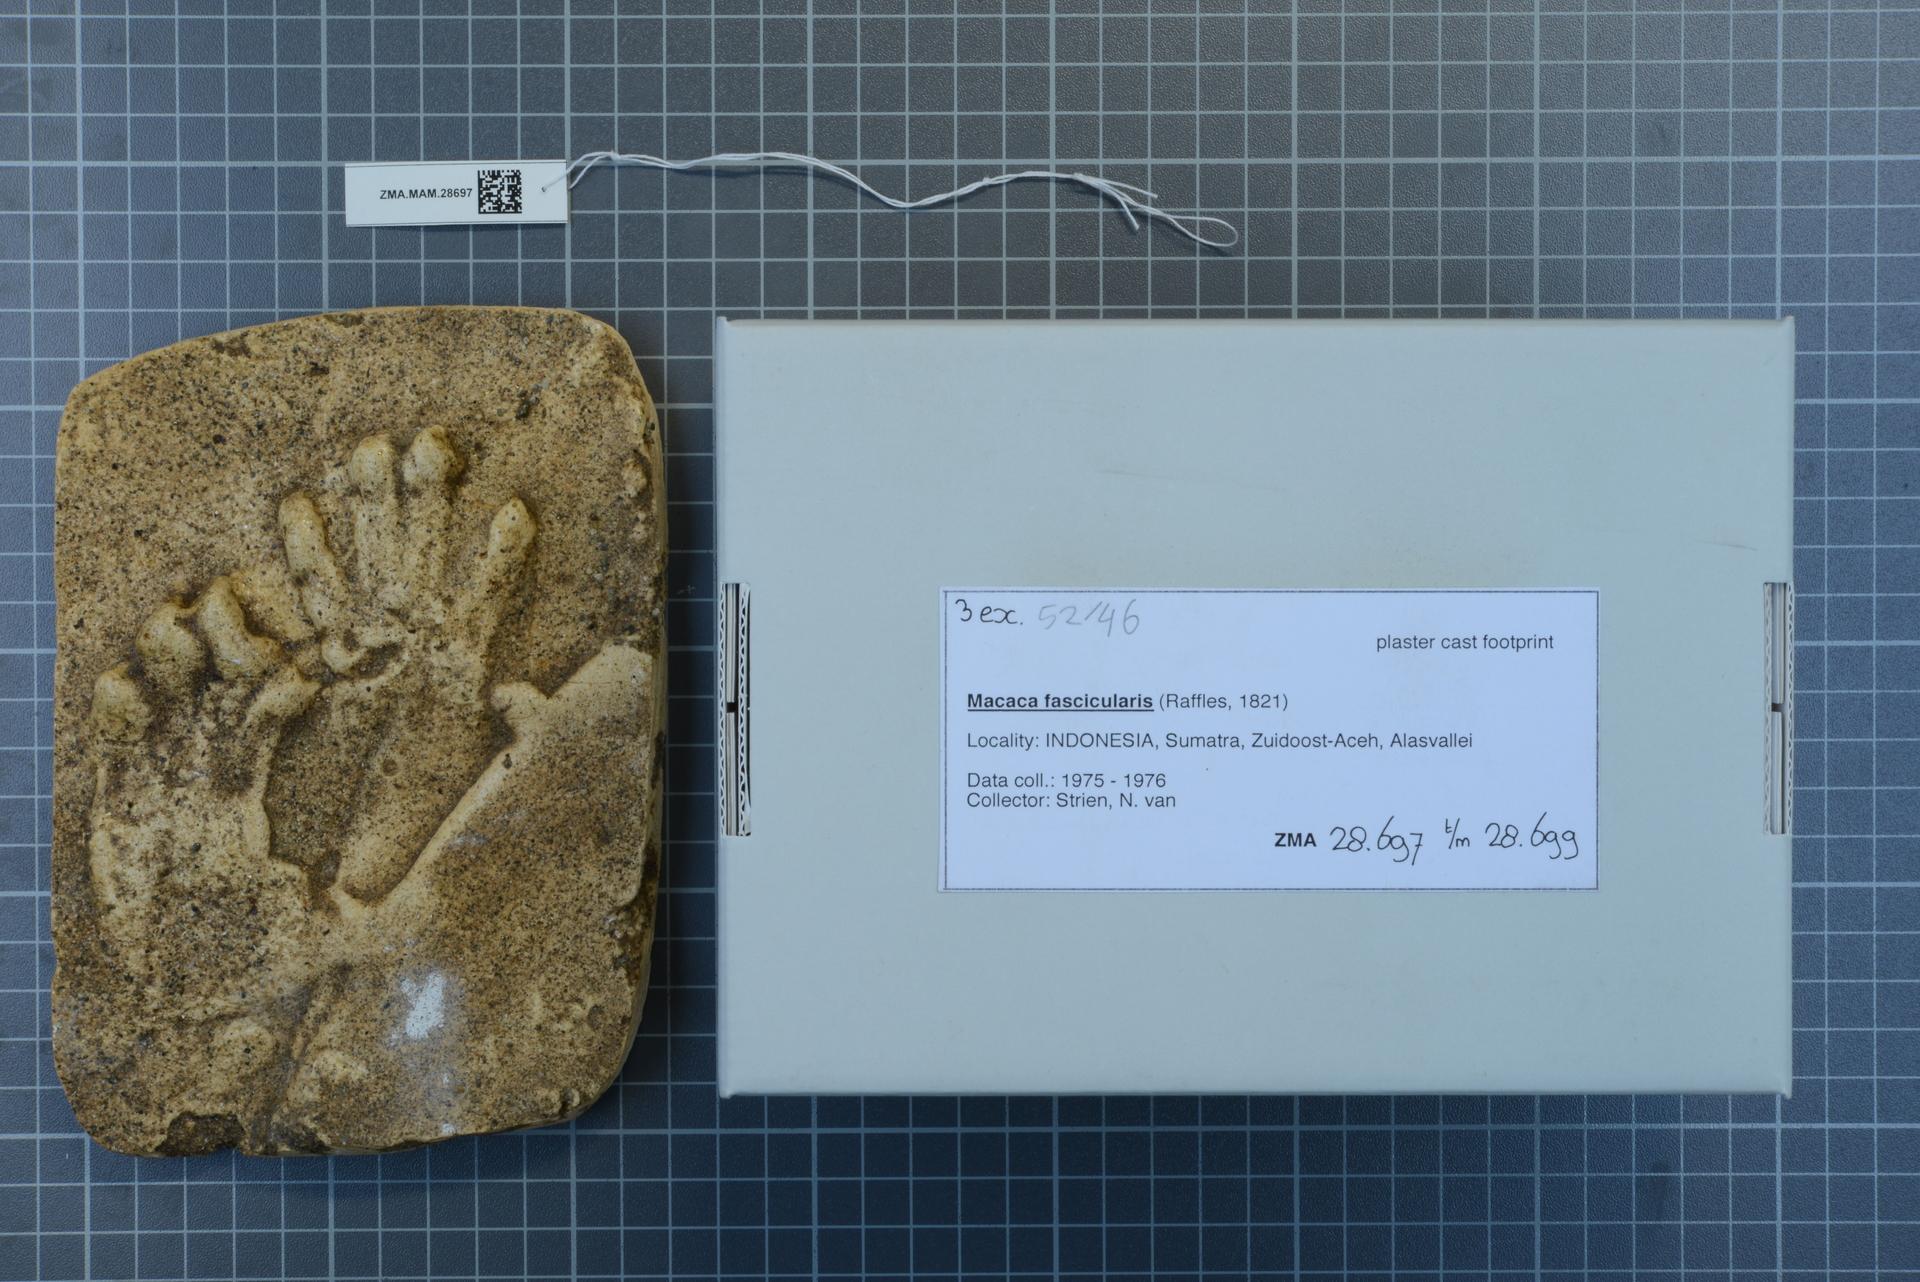 ZMA.MAM.28697 | Macaca fascicularis (Raffles, 1821)